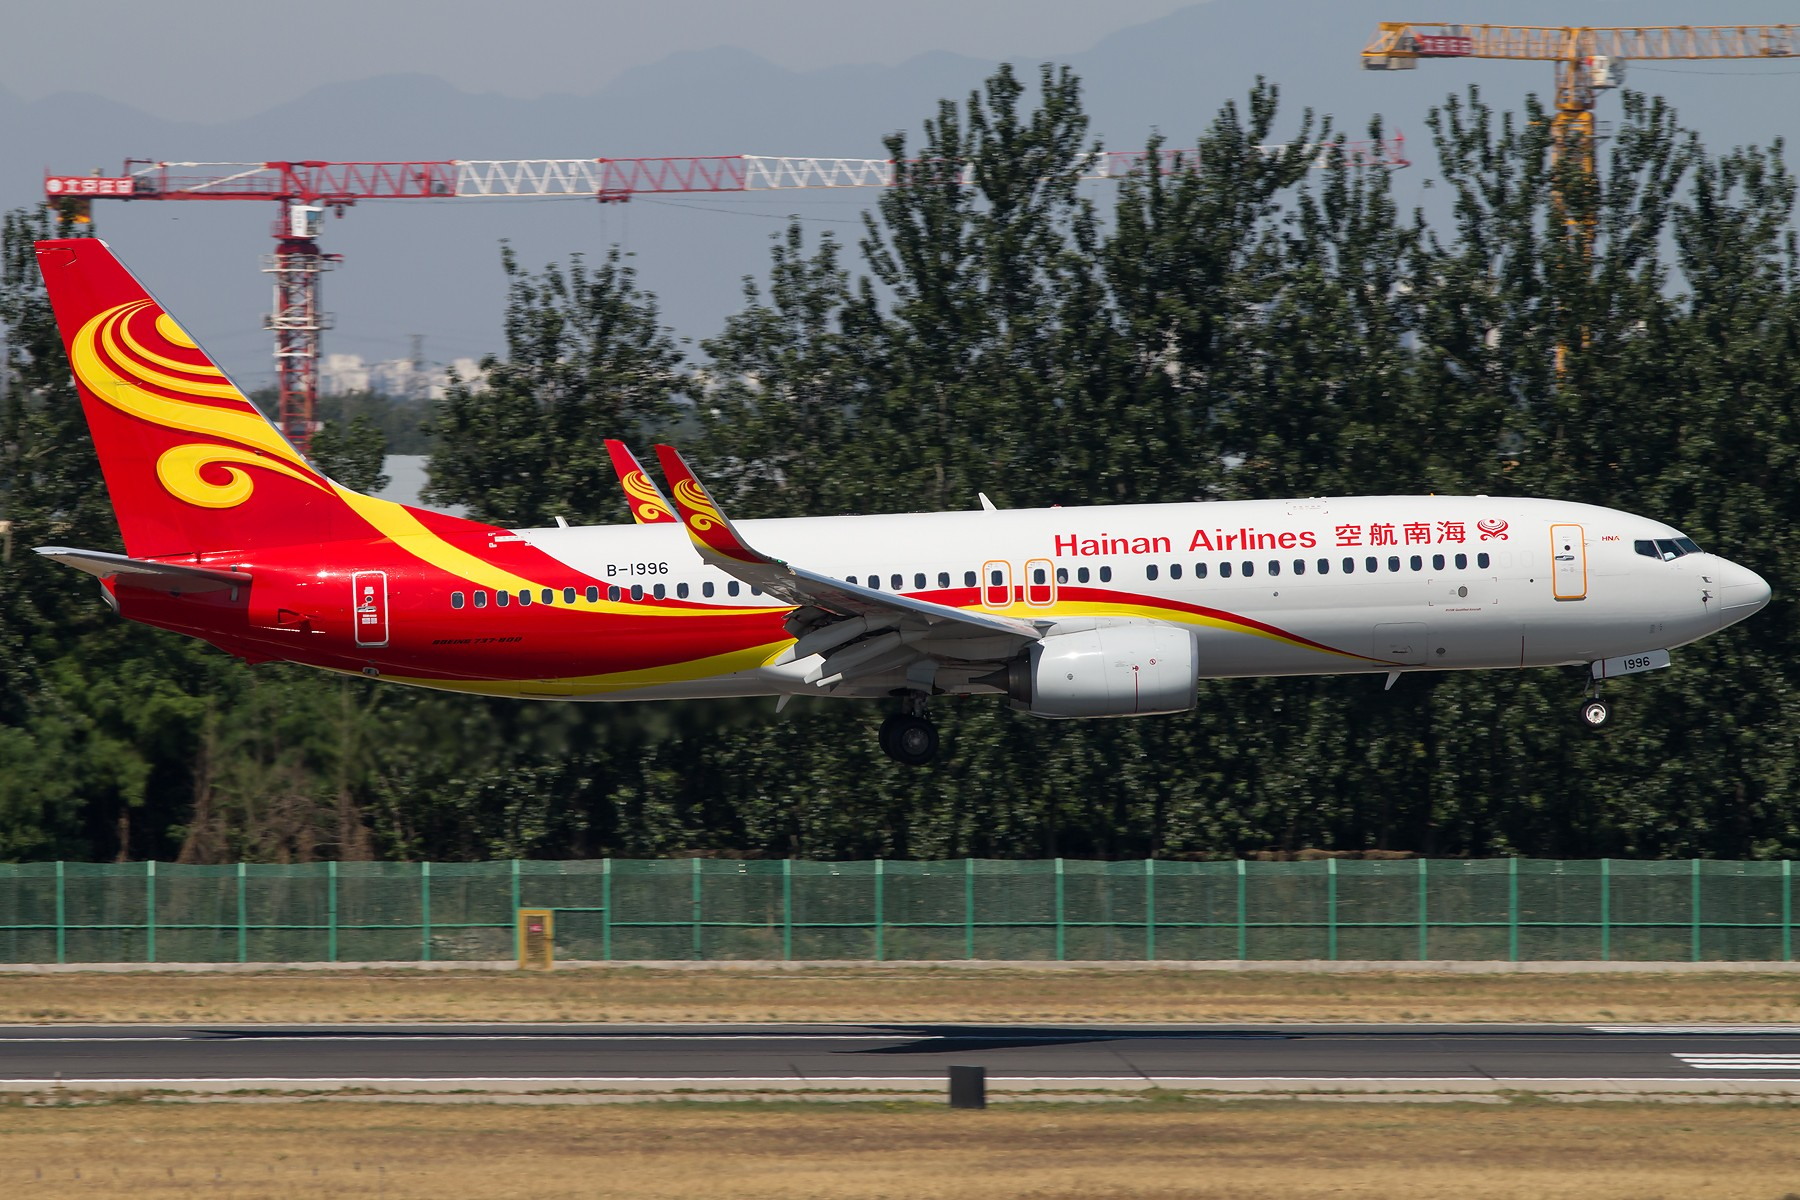 Re:[原创]周末晨练10张 1800*1200 BOEING 737-800 B-1996 中国北京首都国际机场